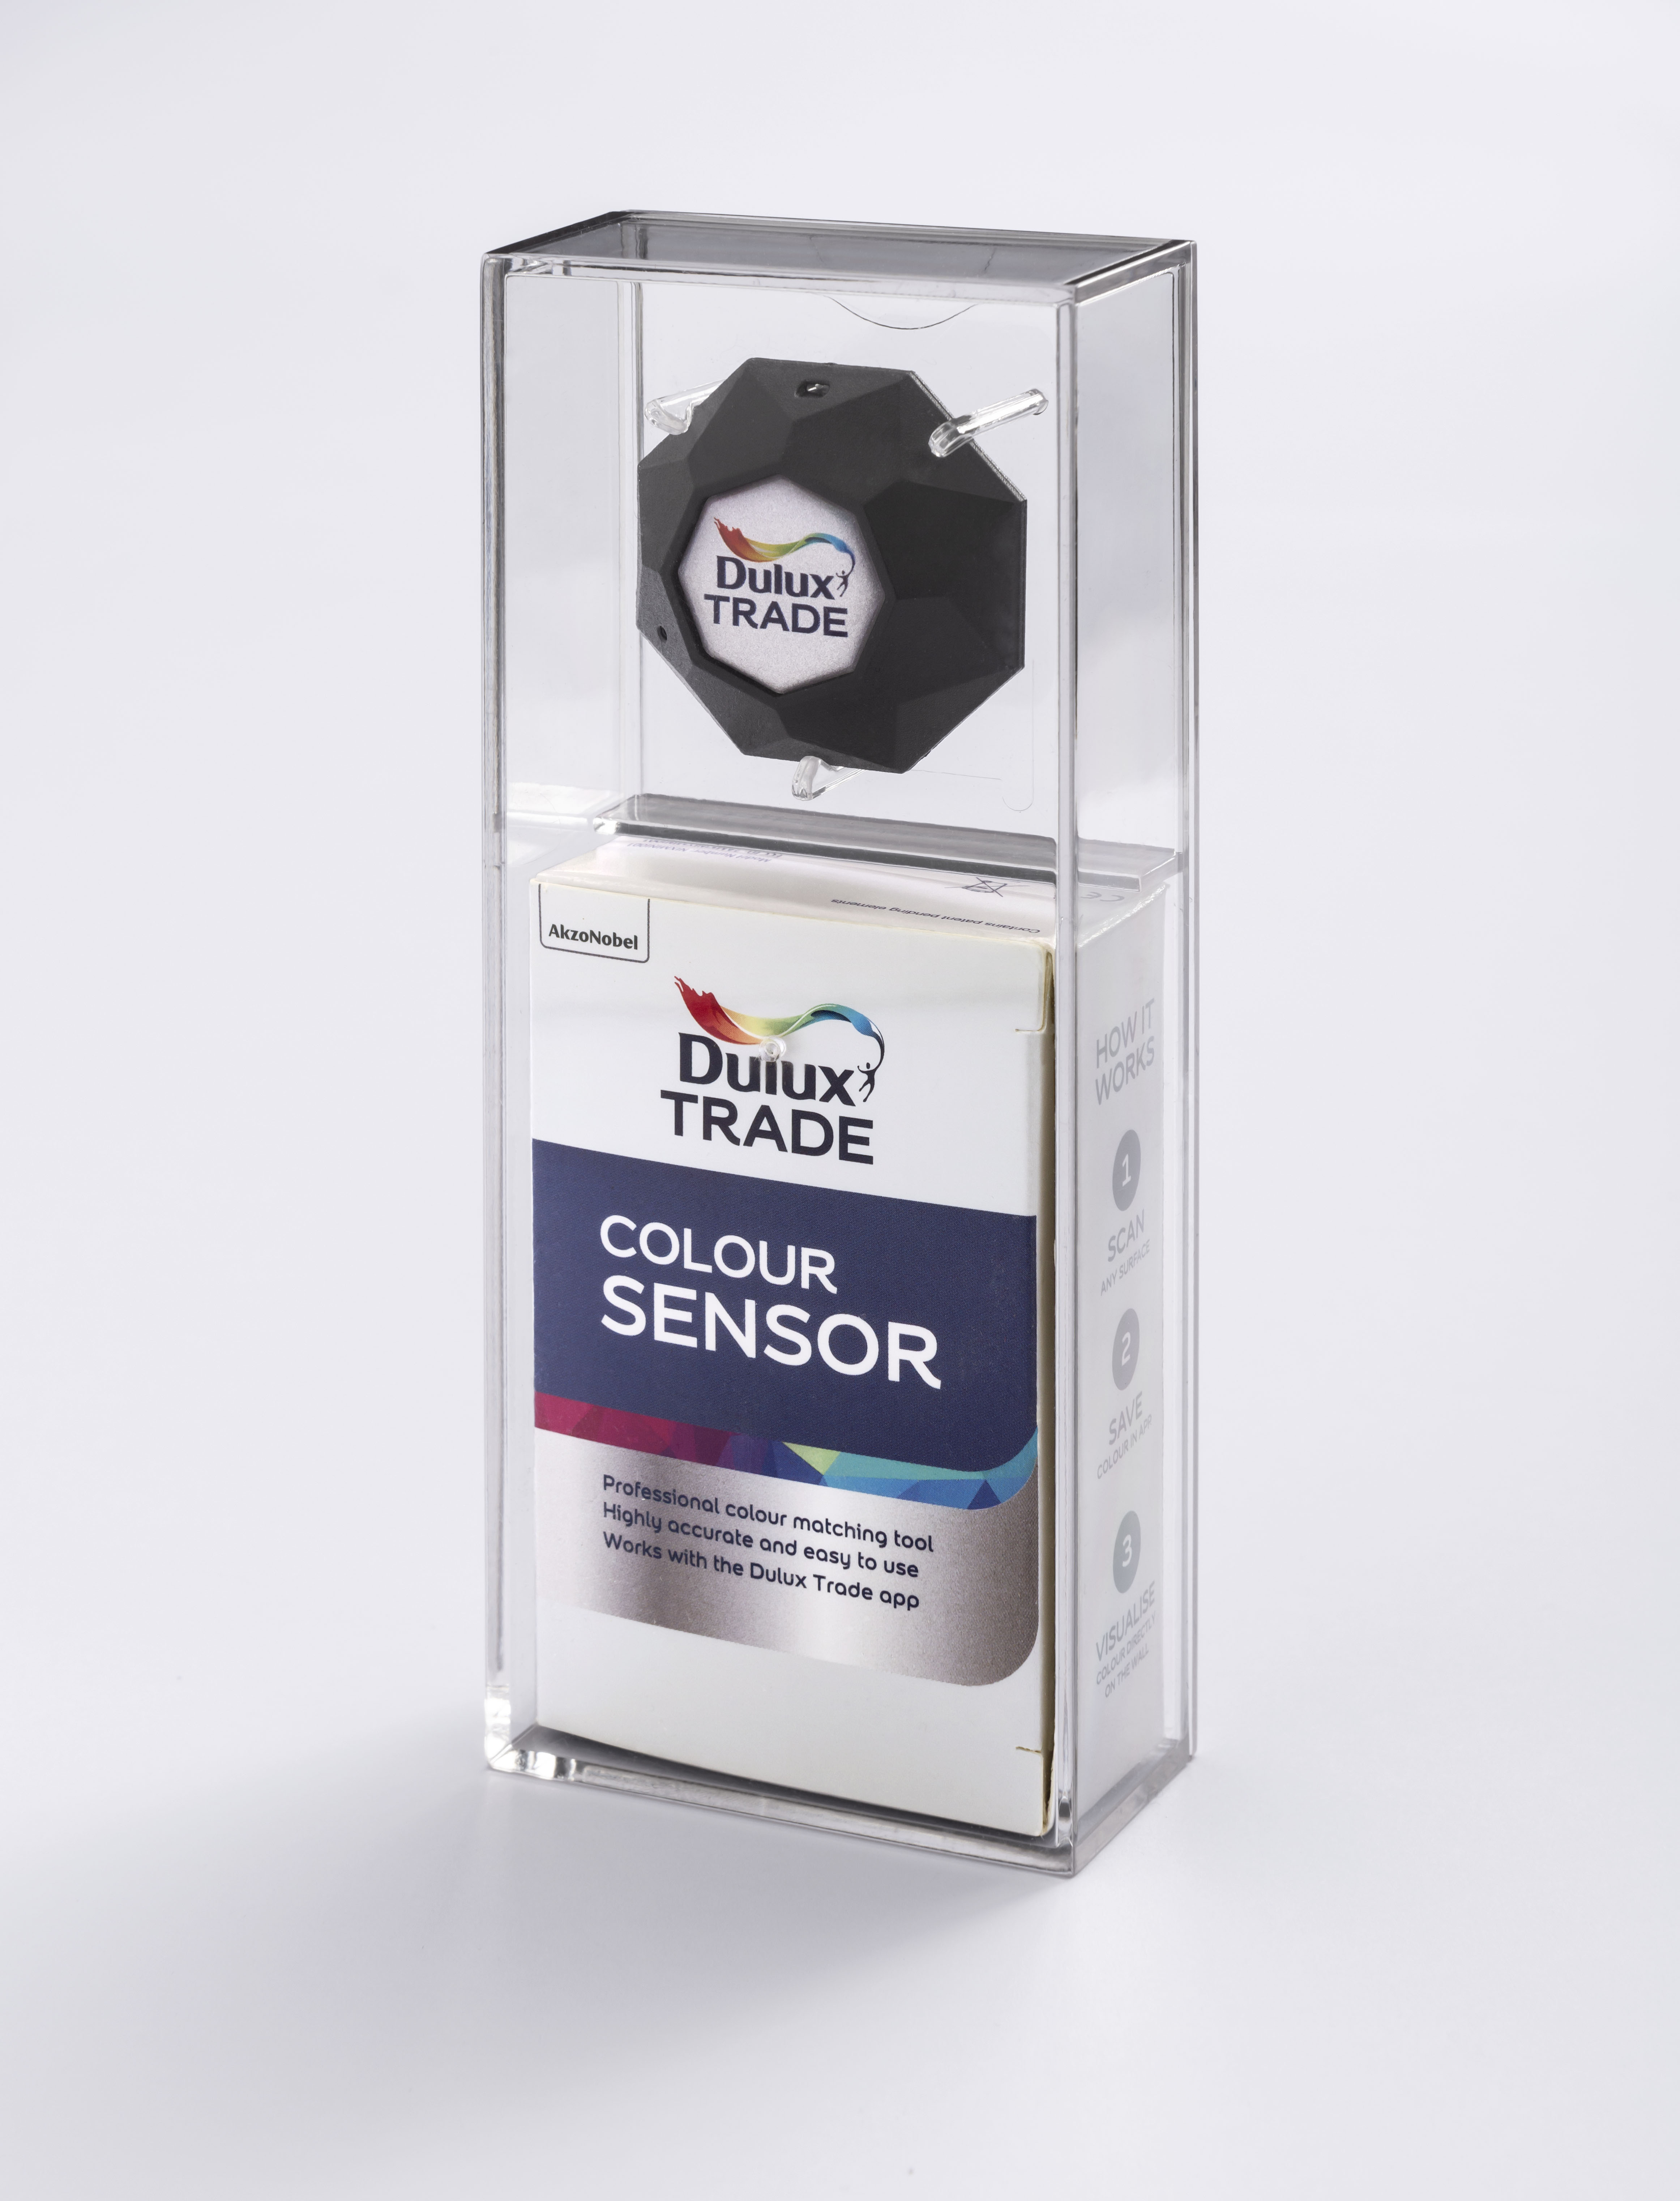 Dulux Trade Colour Sensor